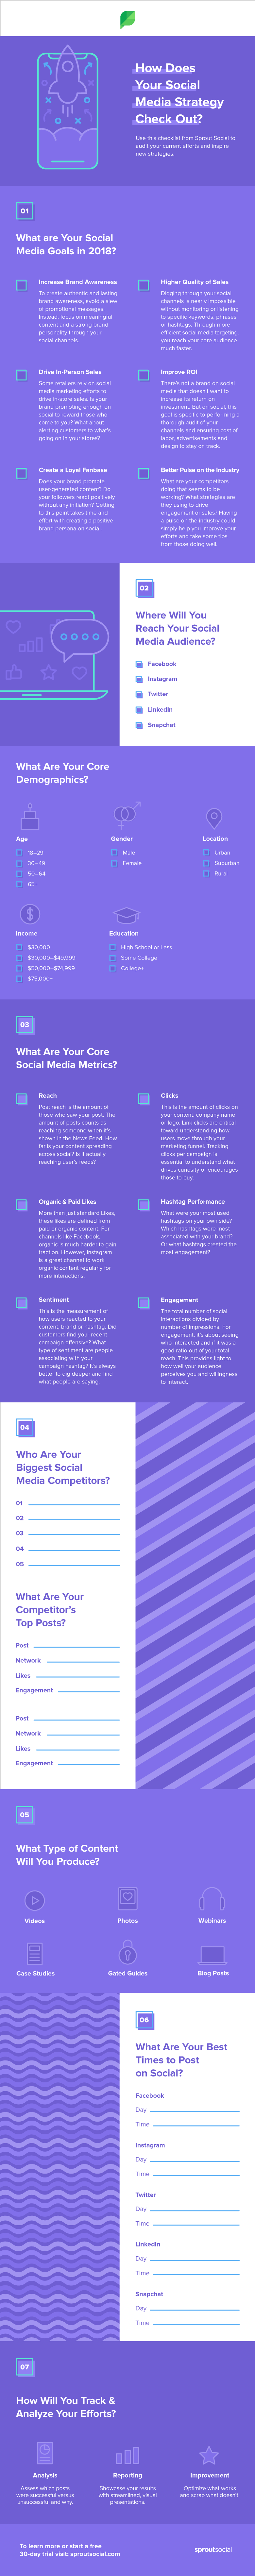 Social Media Marketing Strategy Infographic 2018